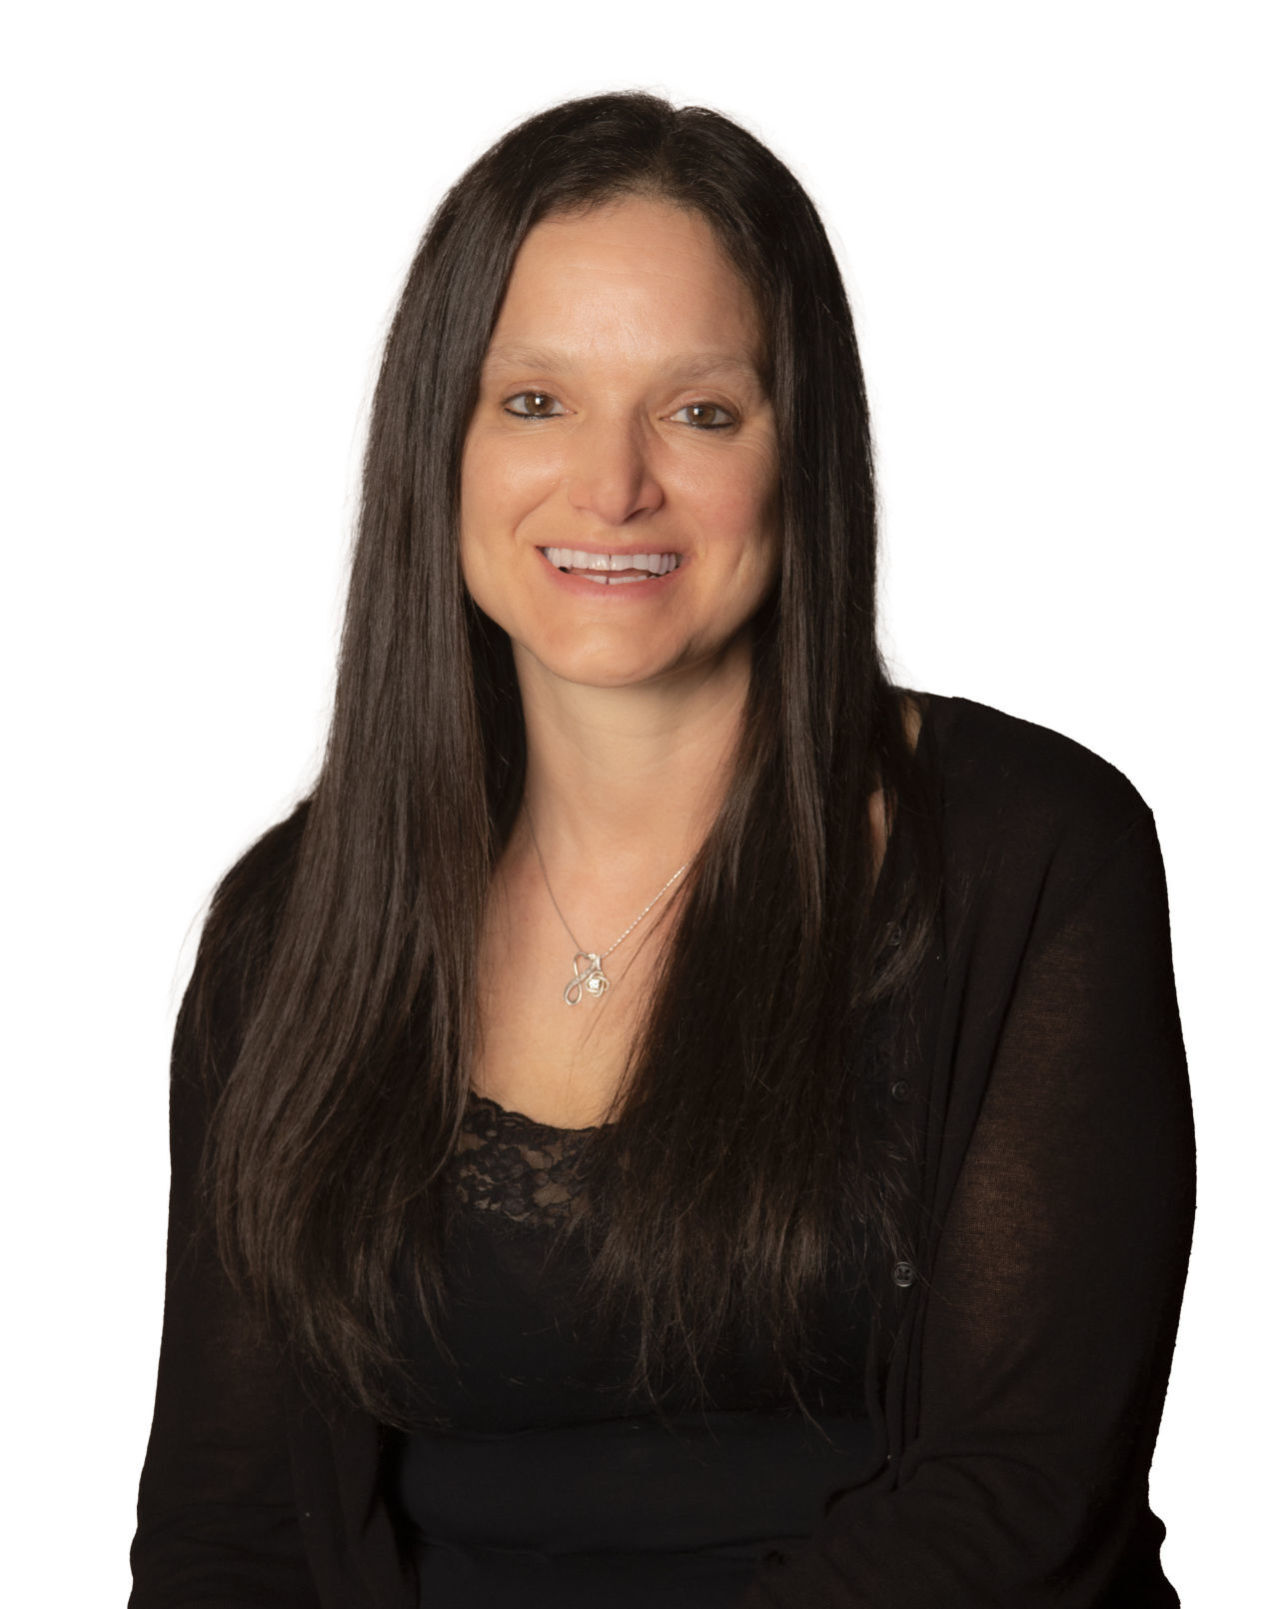 Marlene Sebastianelli